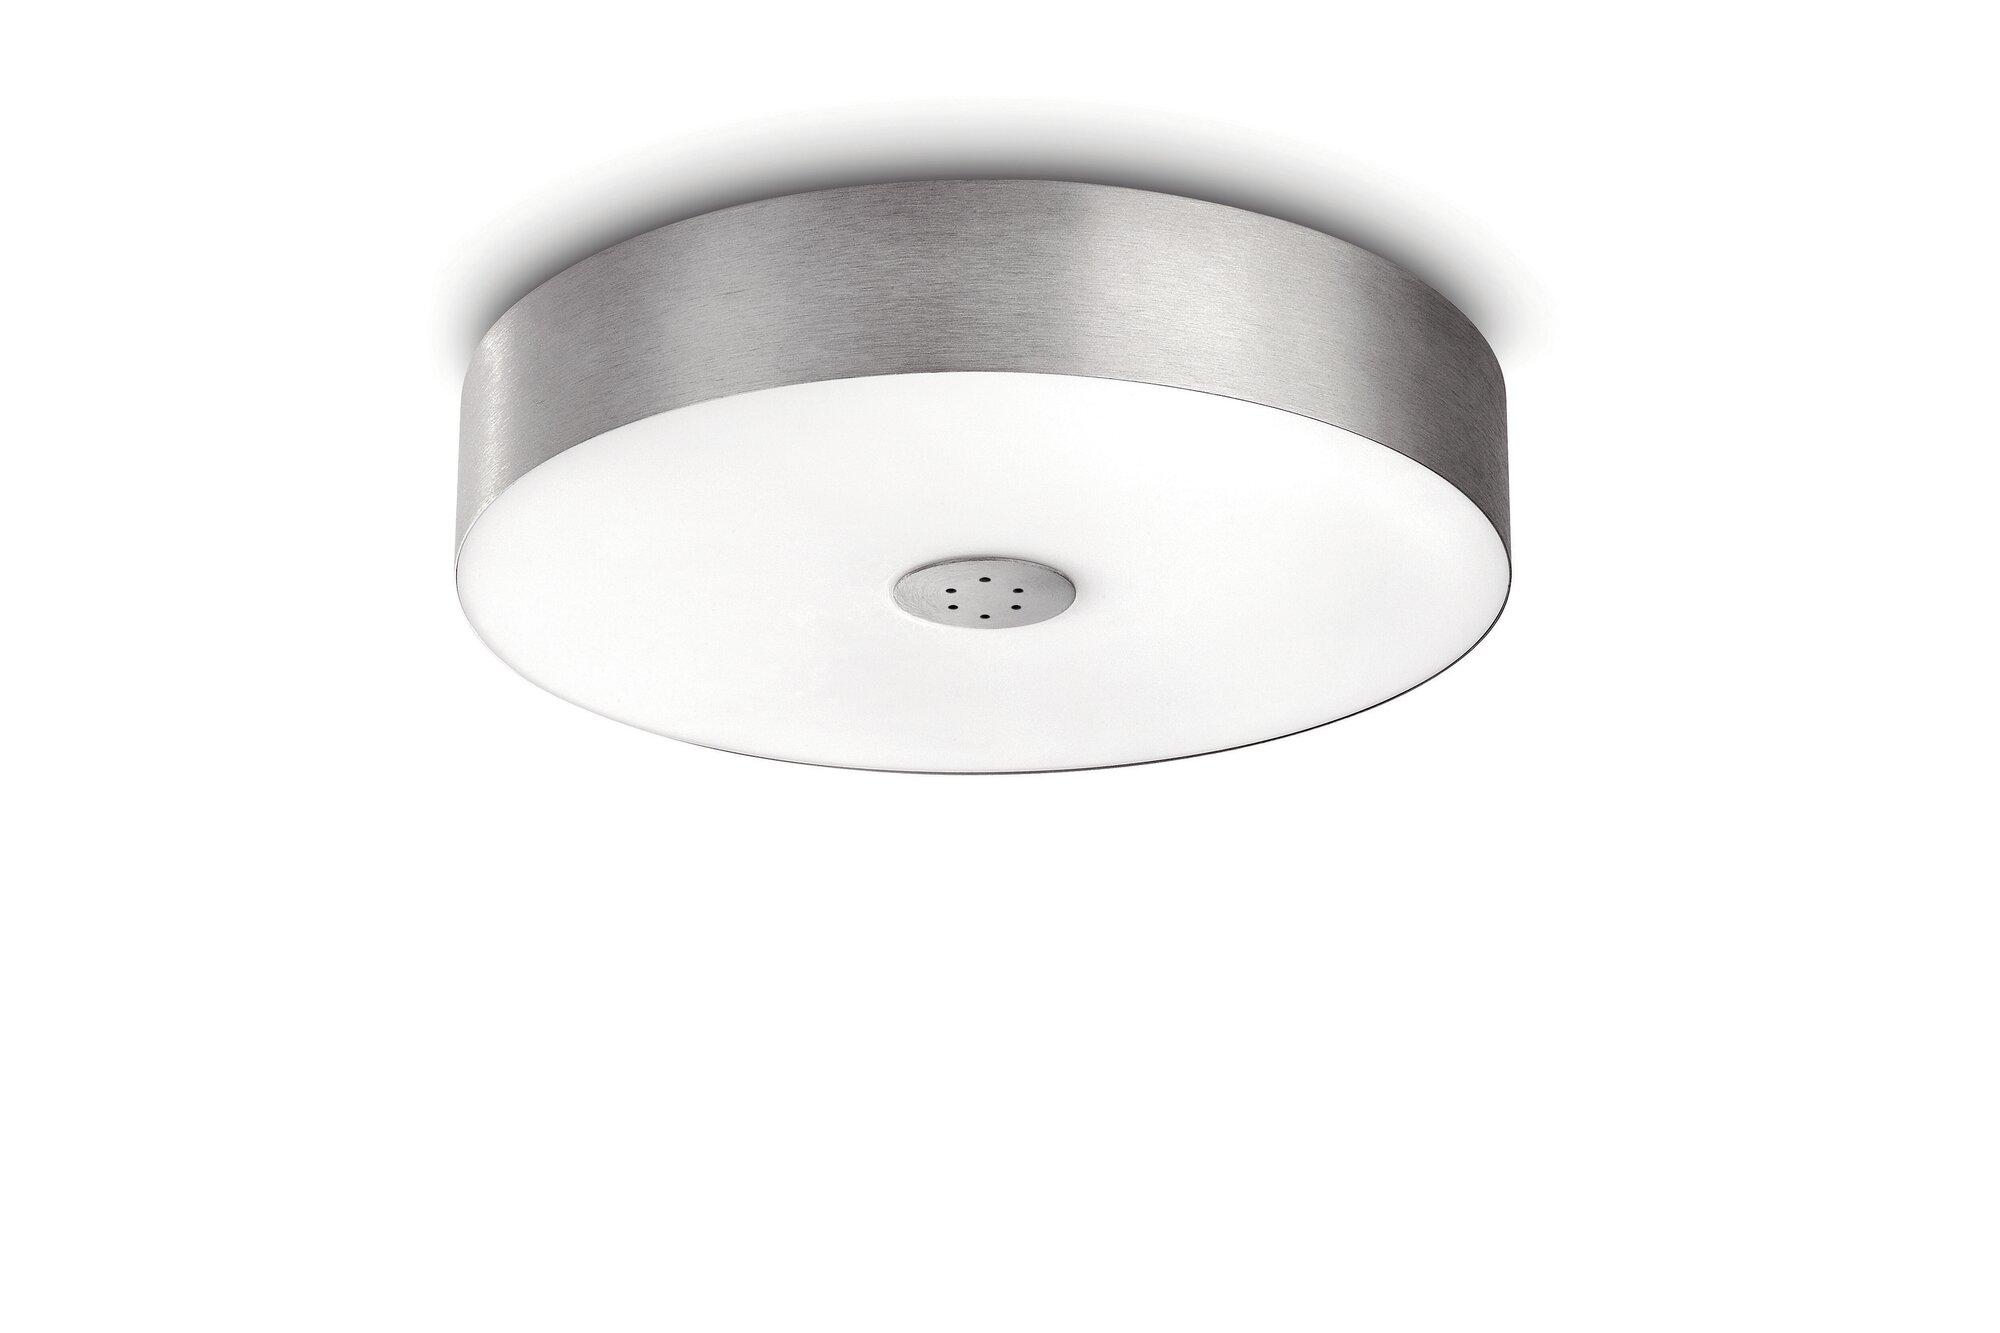 philips consumer luminaire 17 5 flush mount ebay. Black Bedroom Furniture Sets. Home Design Ideas